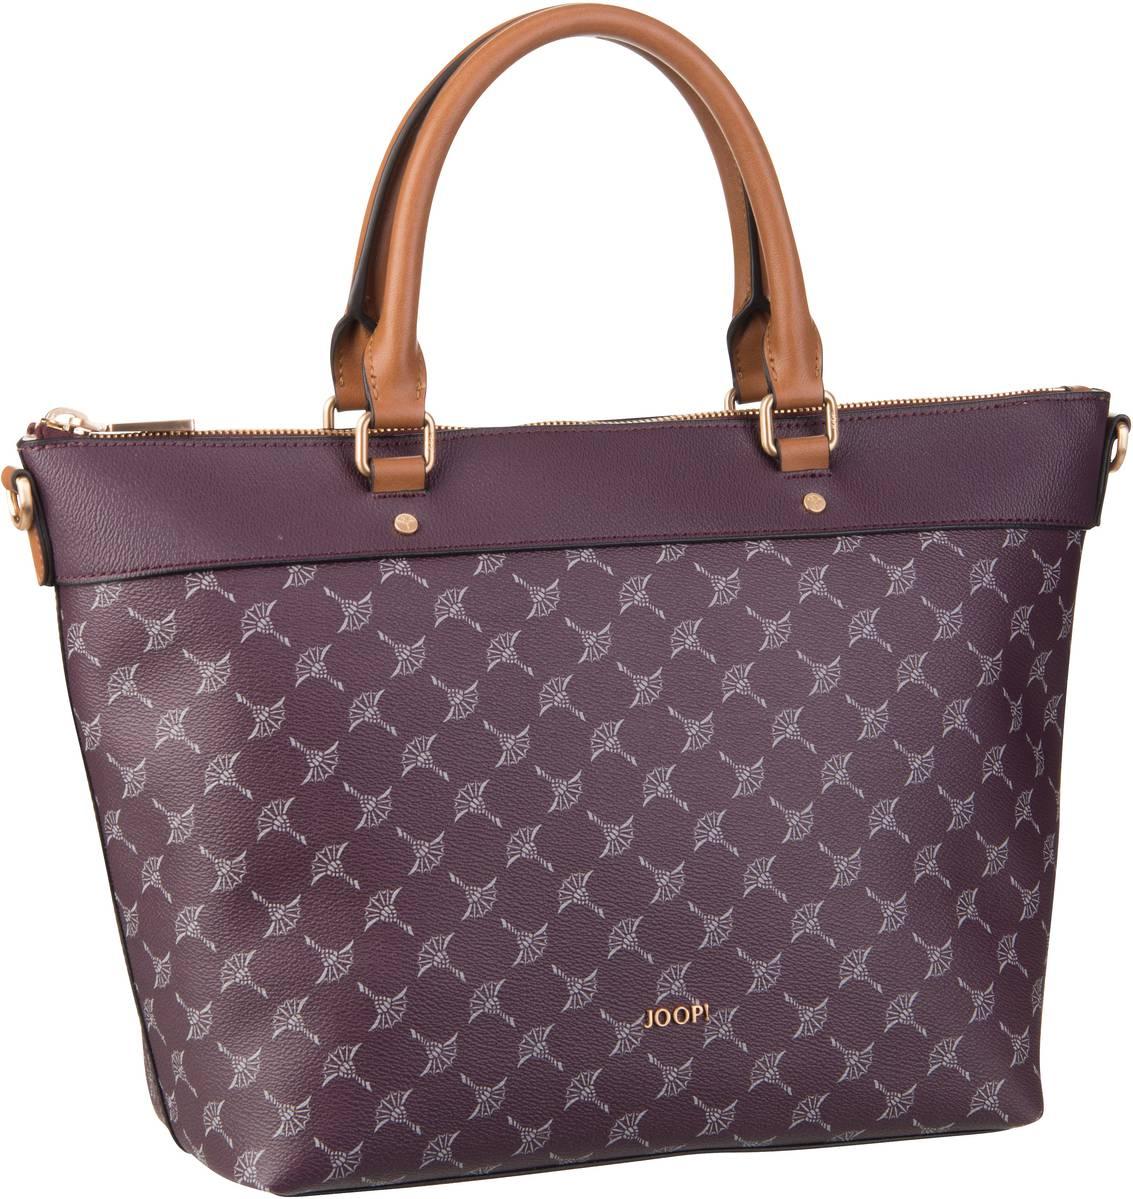 Handtasche Thoosa Cortina Handbag Small Burgundy